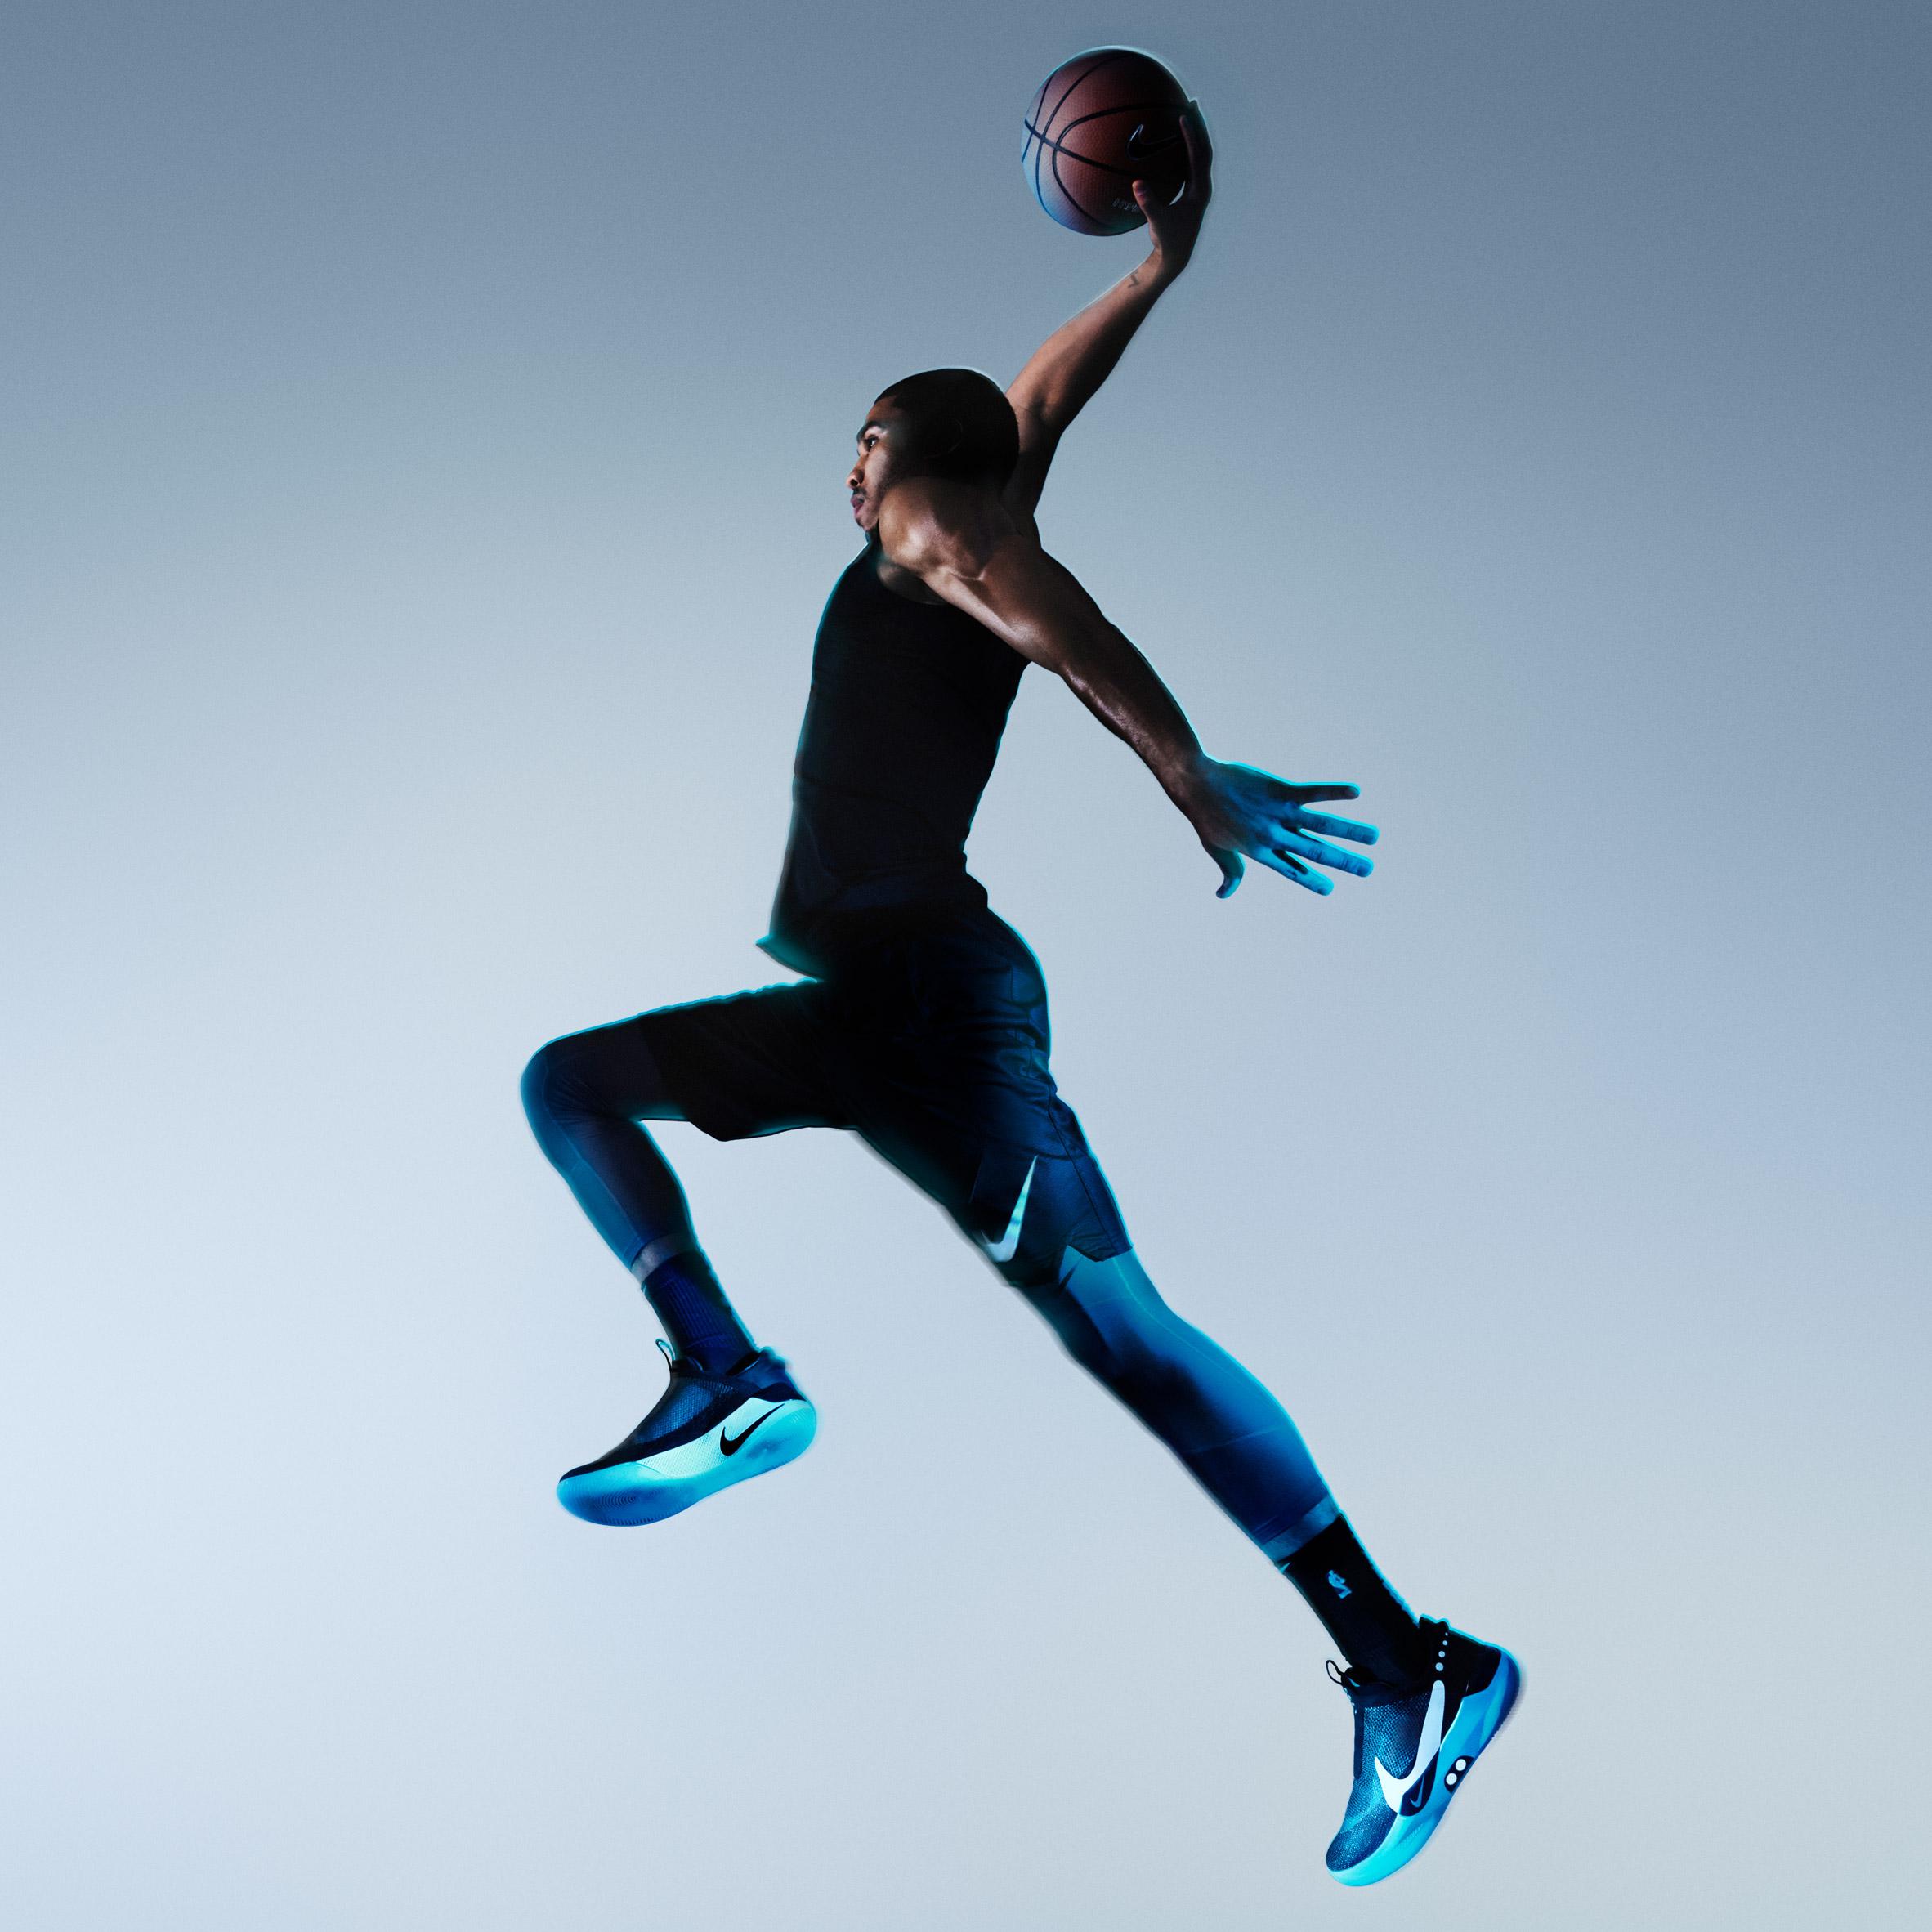 Nike Adapt BB smart basketball sneakers